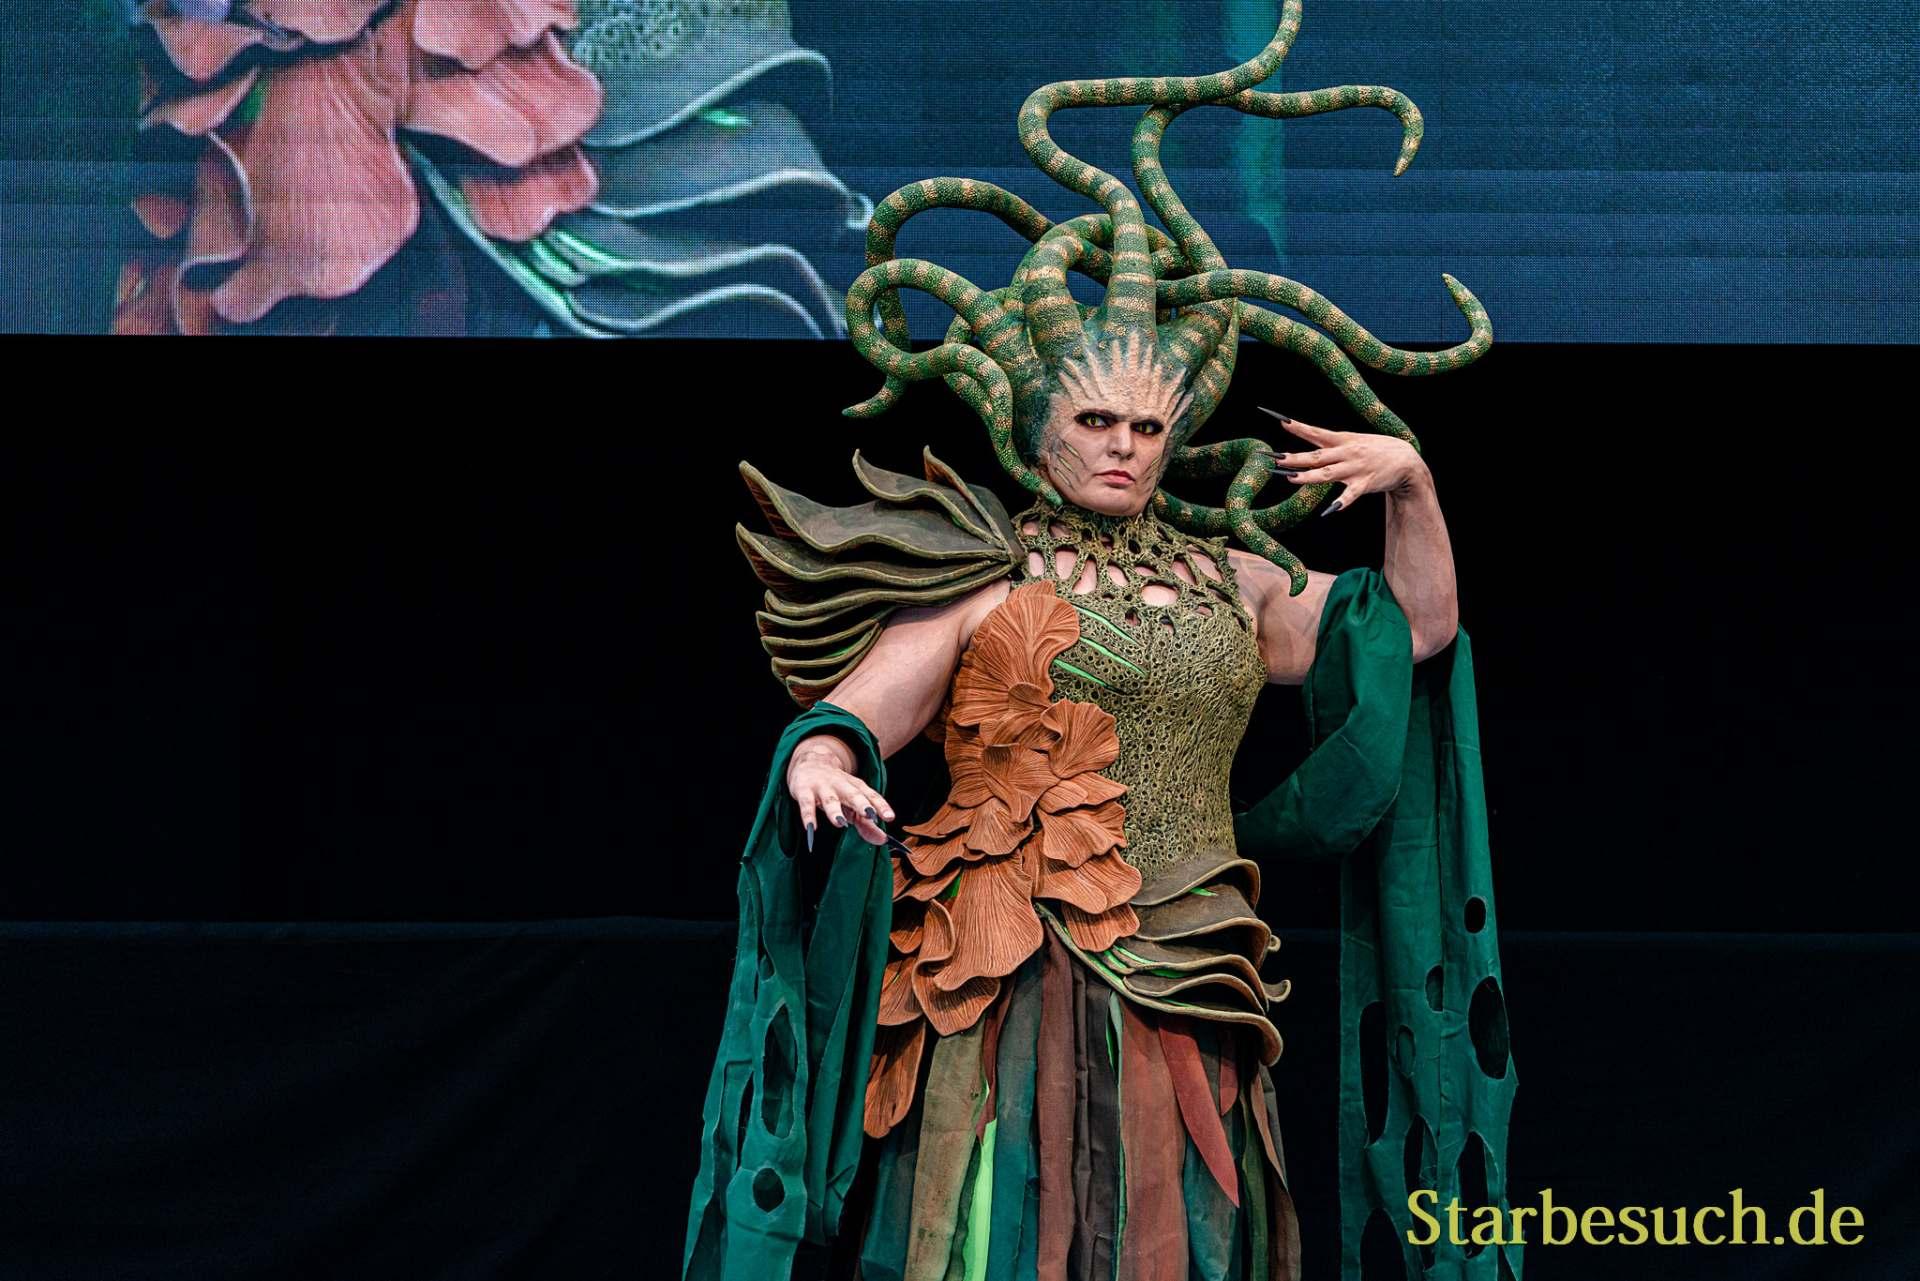 Cosplay Contest #5: Vraska as Majestaetische Gorgo from Magic the Gathering